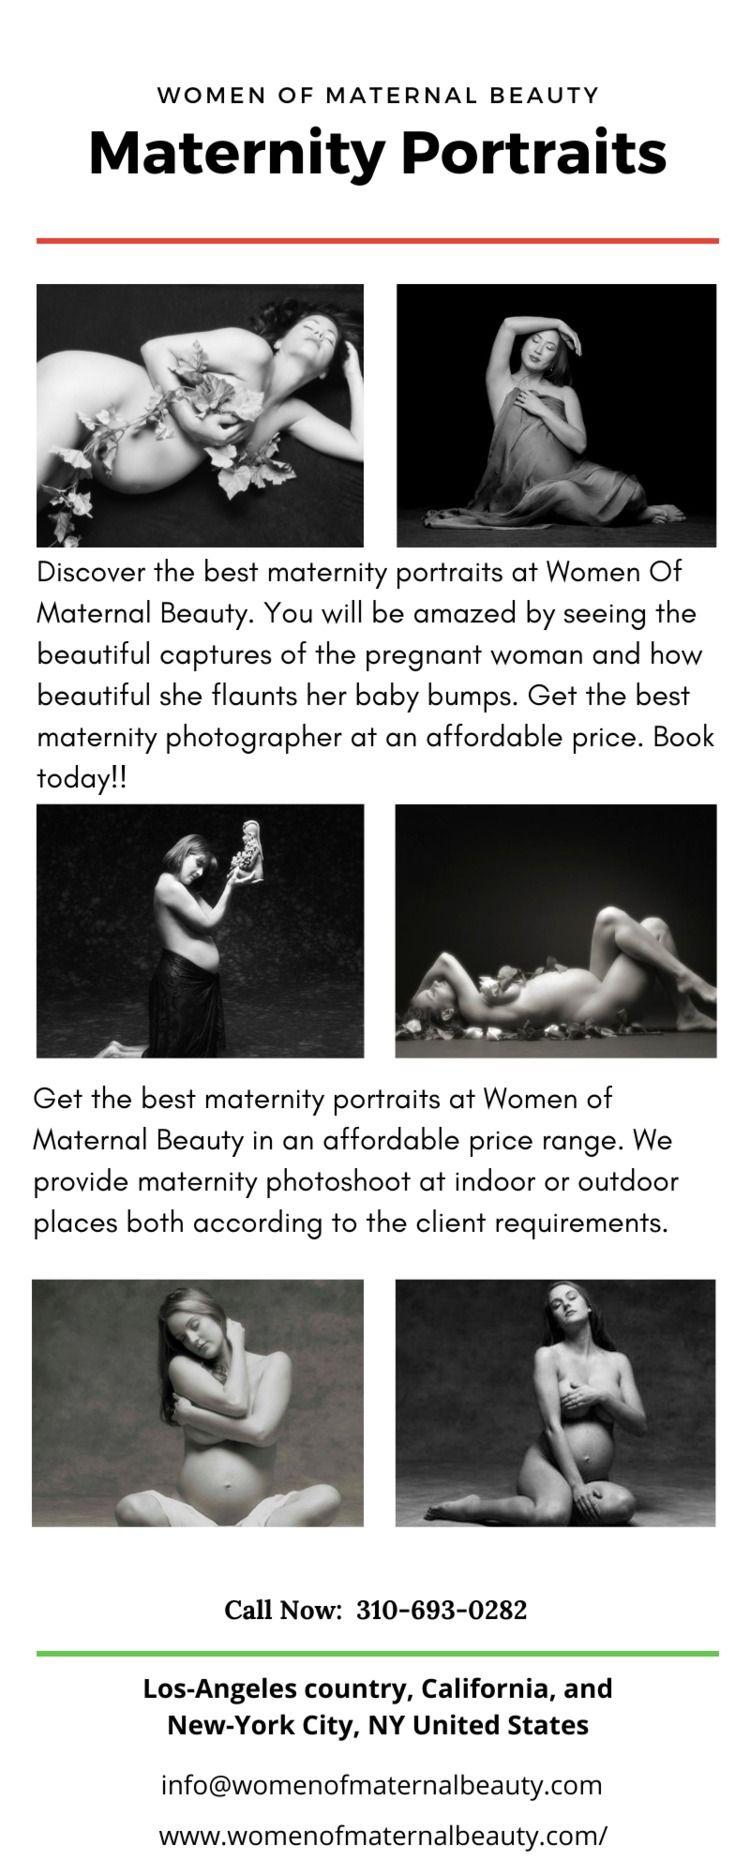 Discover maternity portraits Wo - maternalbeauty   ello